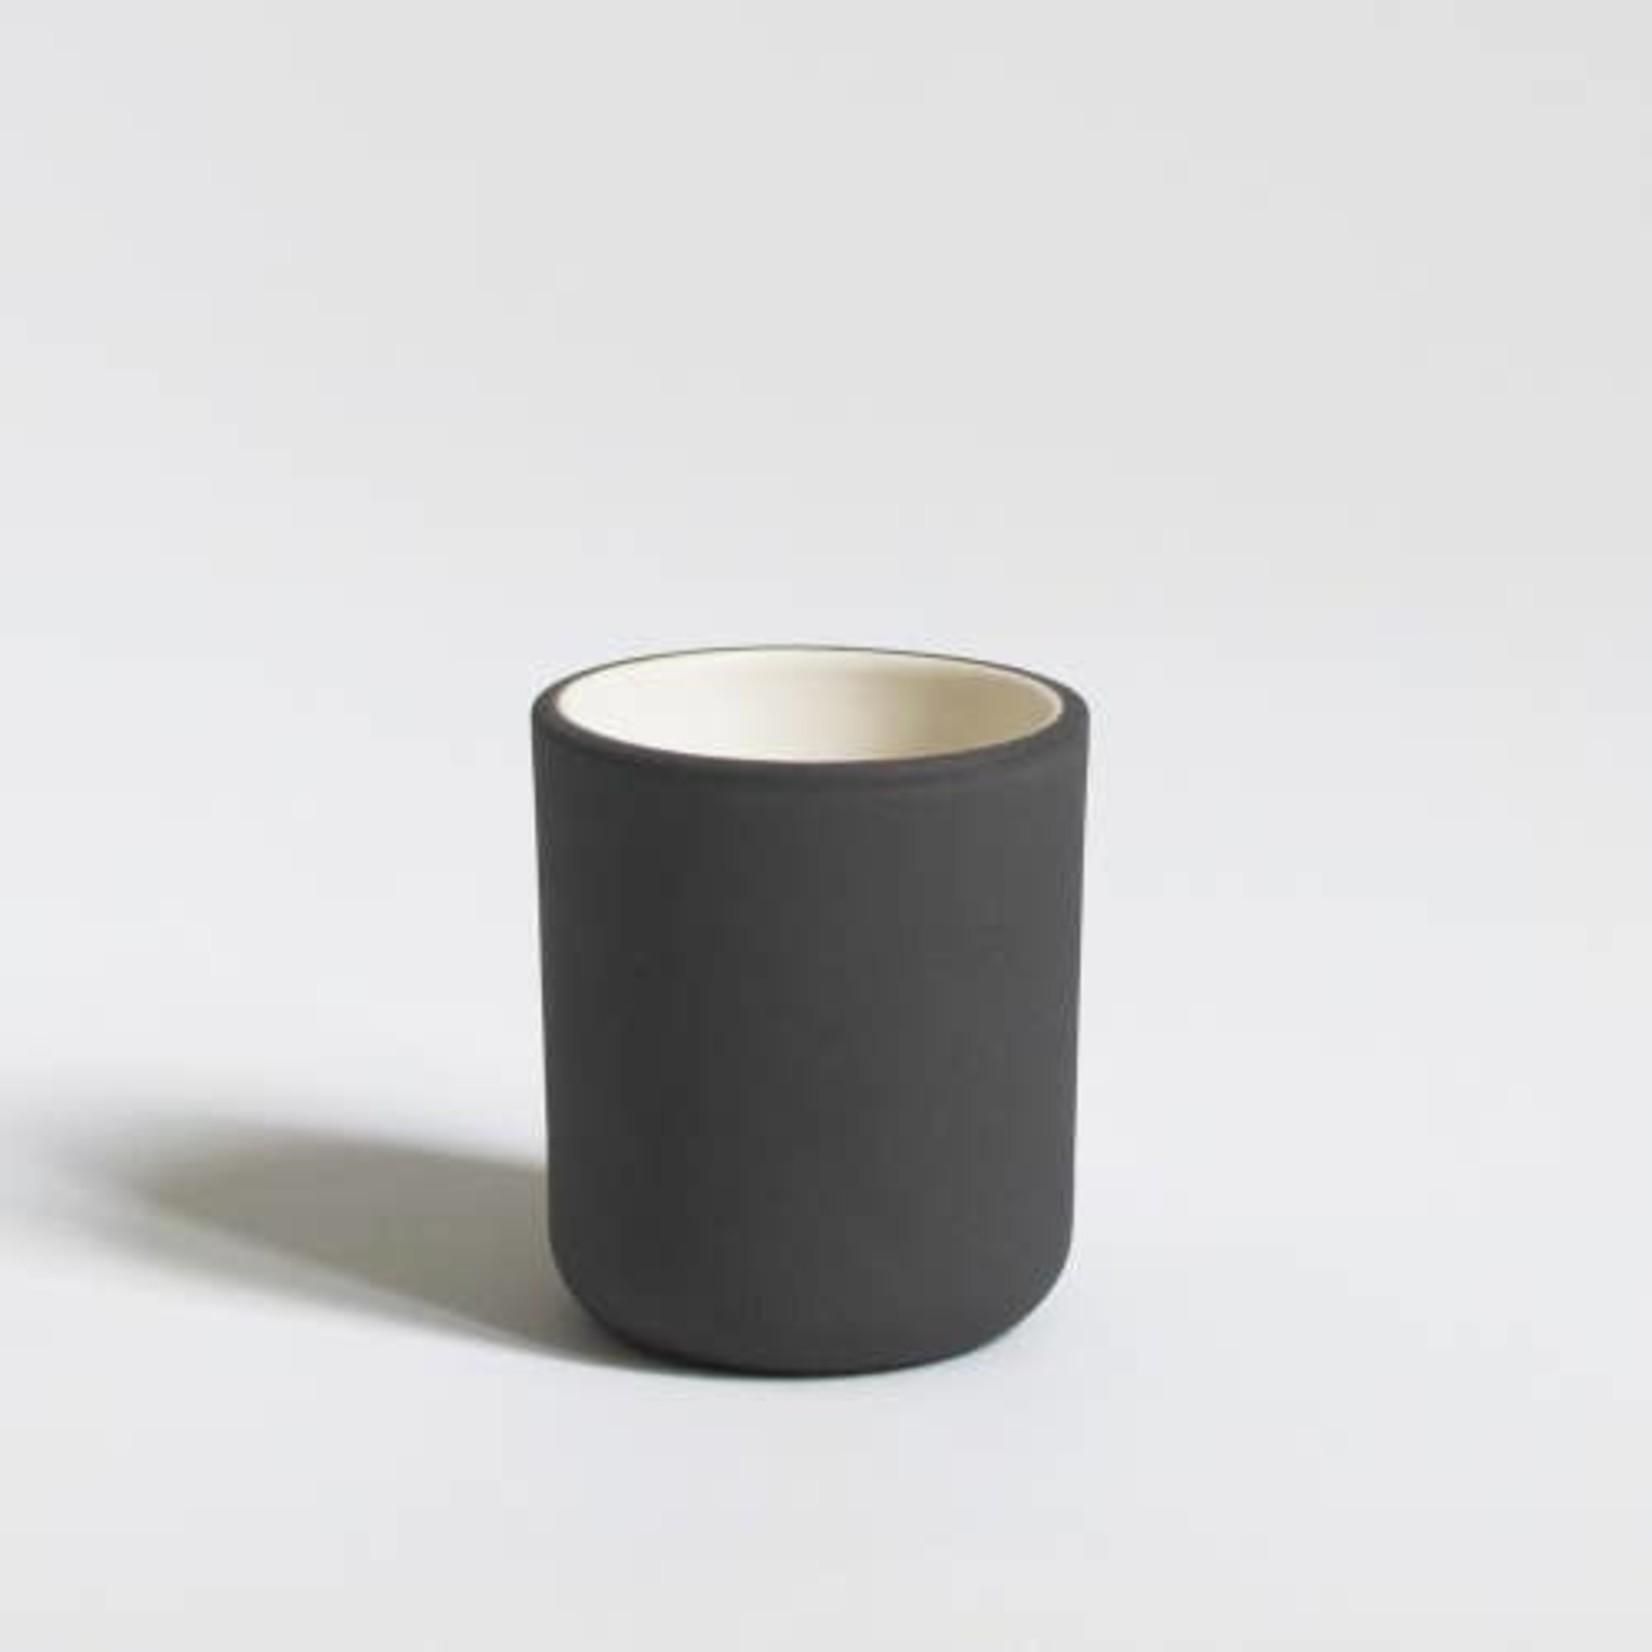 Archive Studio Archive Studio Handmade Espresso Cup Dark Grey